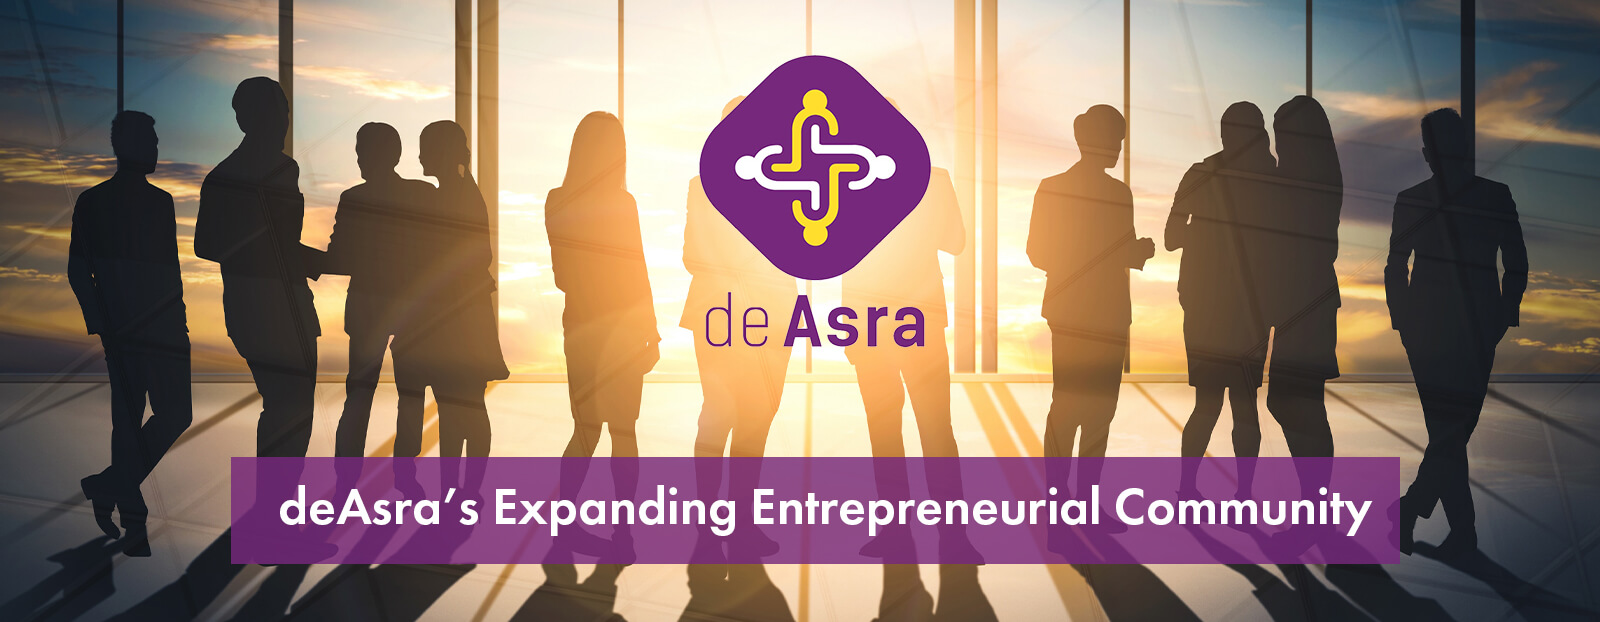 deAsra's Expanding Entrepreneurial Community